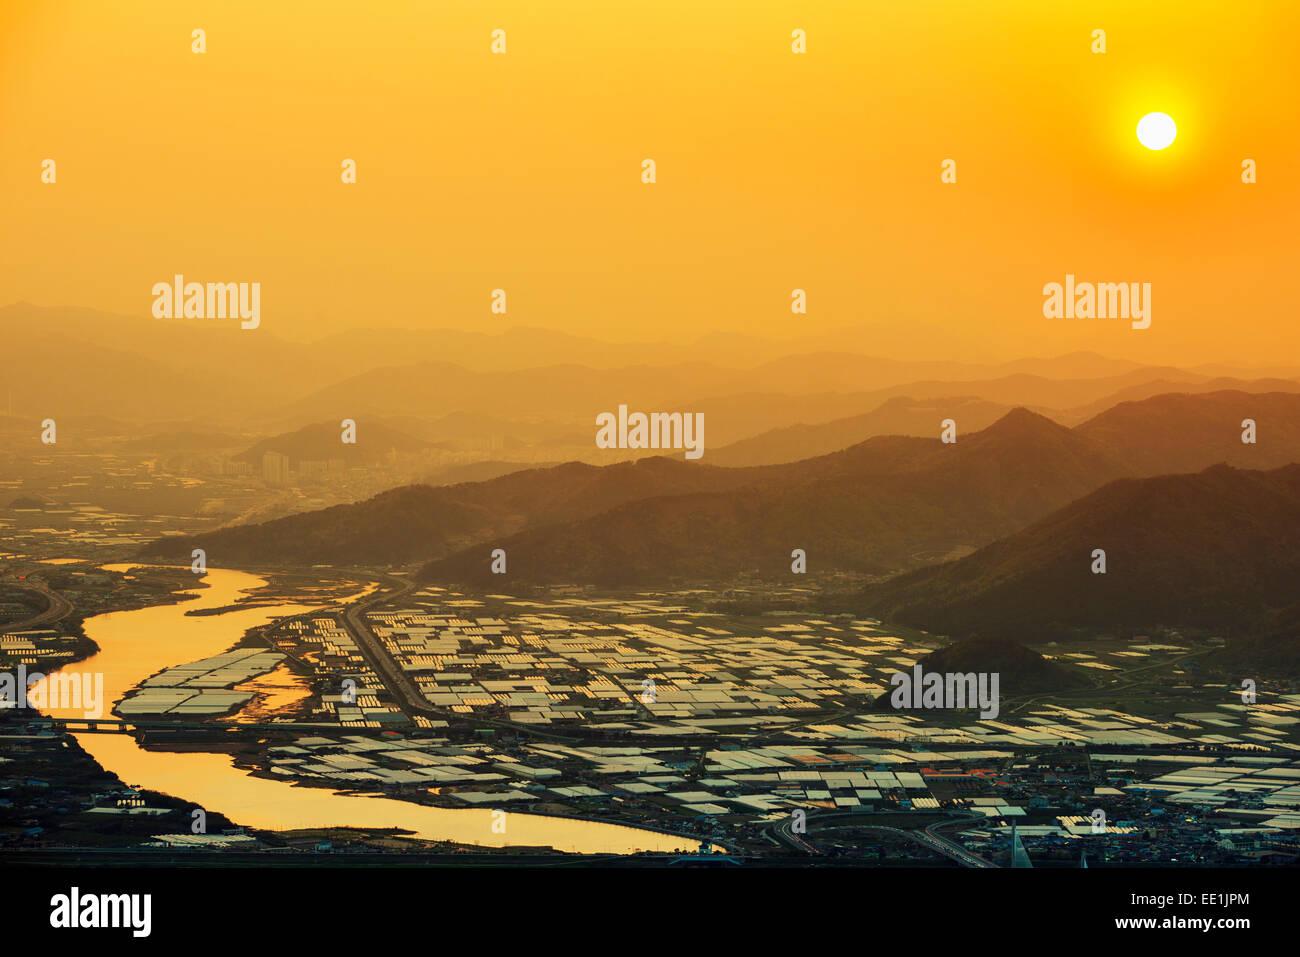 Sonnenuntergang über der Stadt, Busan, Südkorea, Asien Stockbild